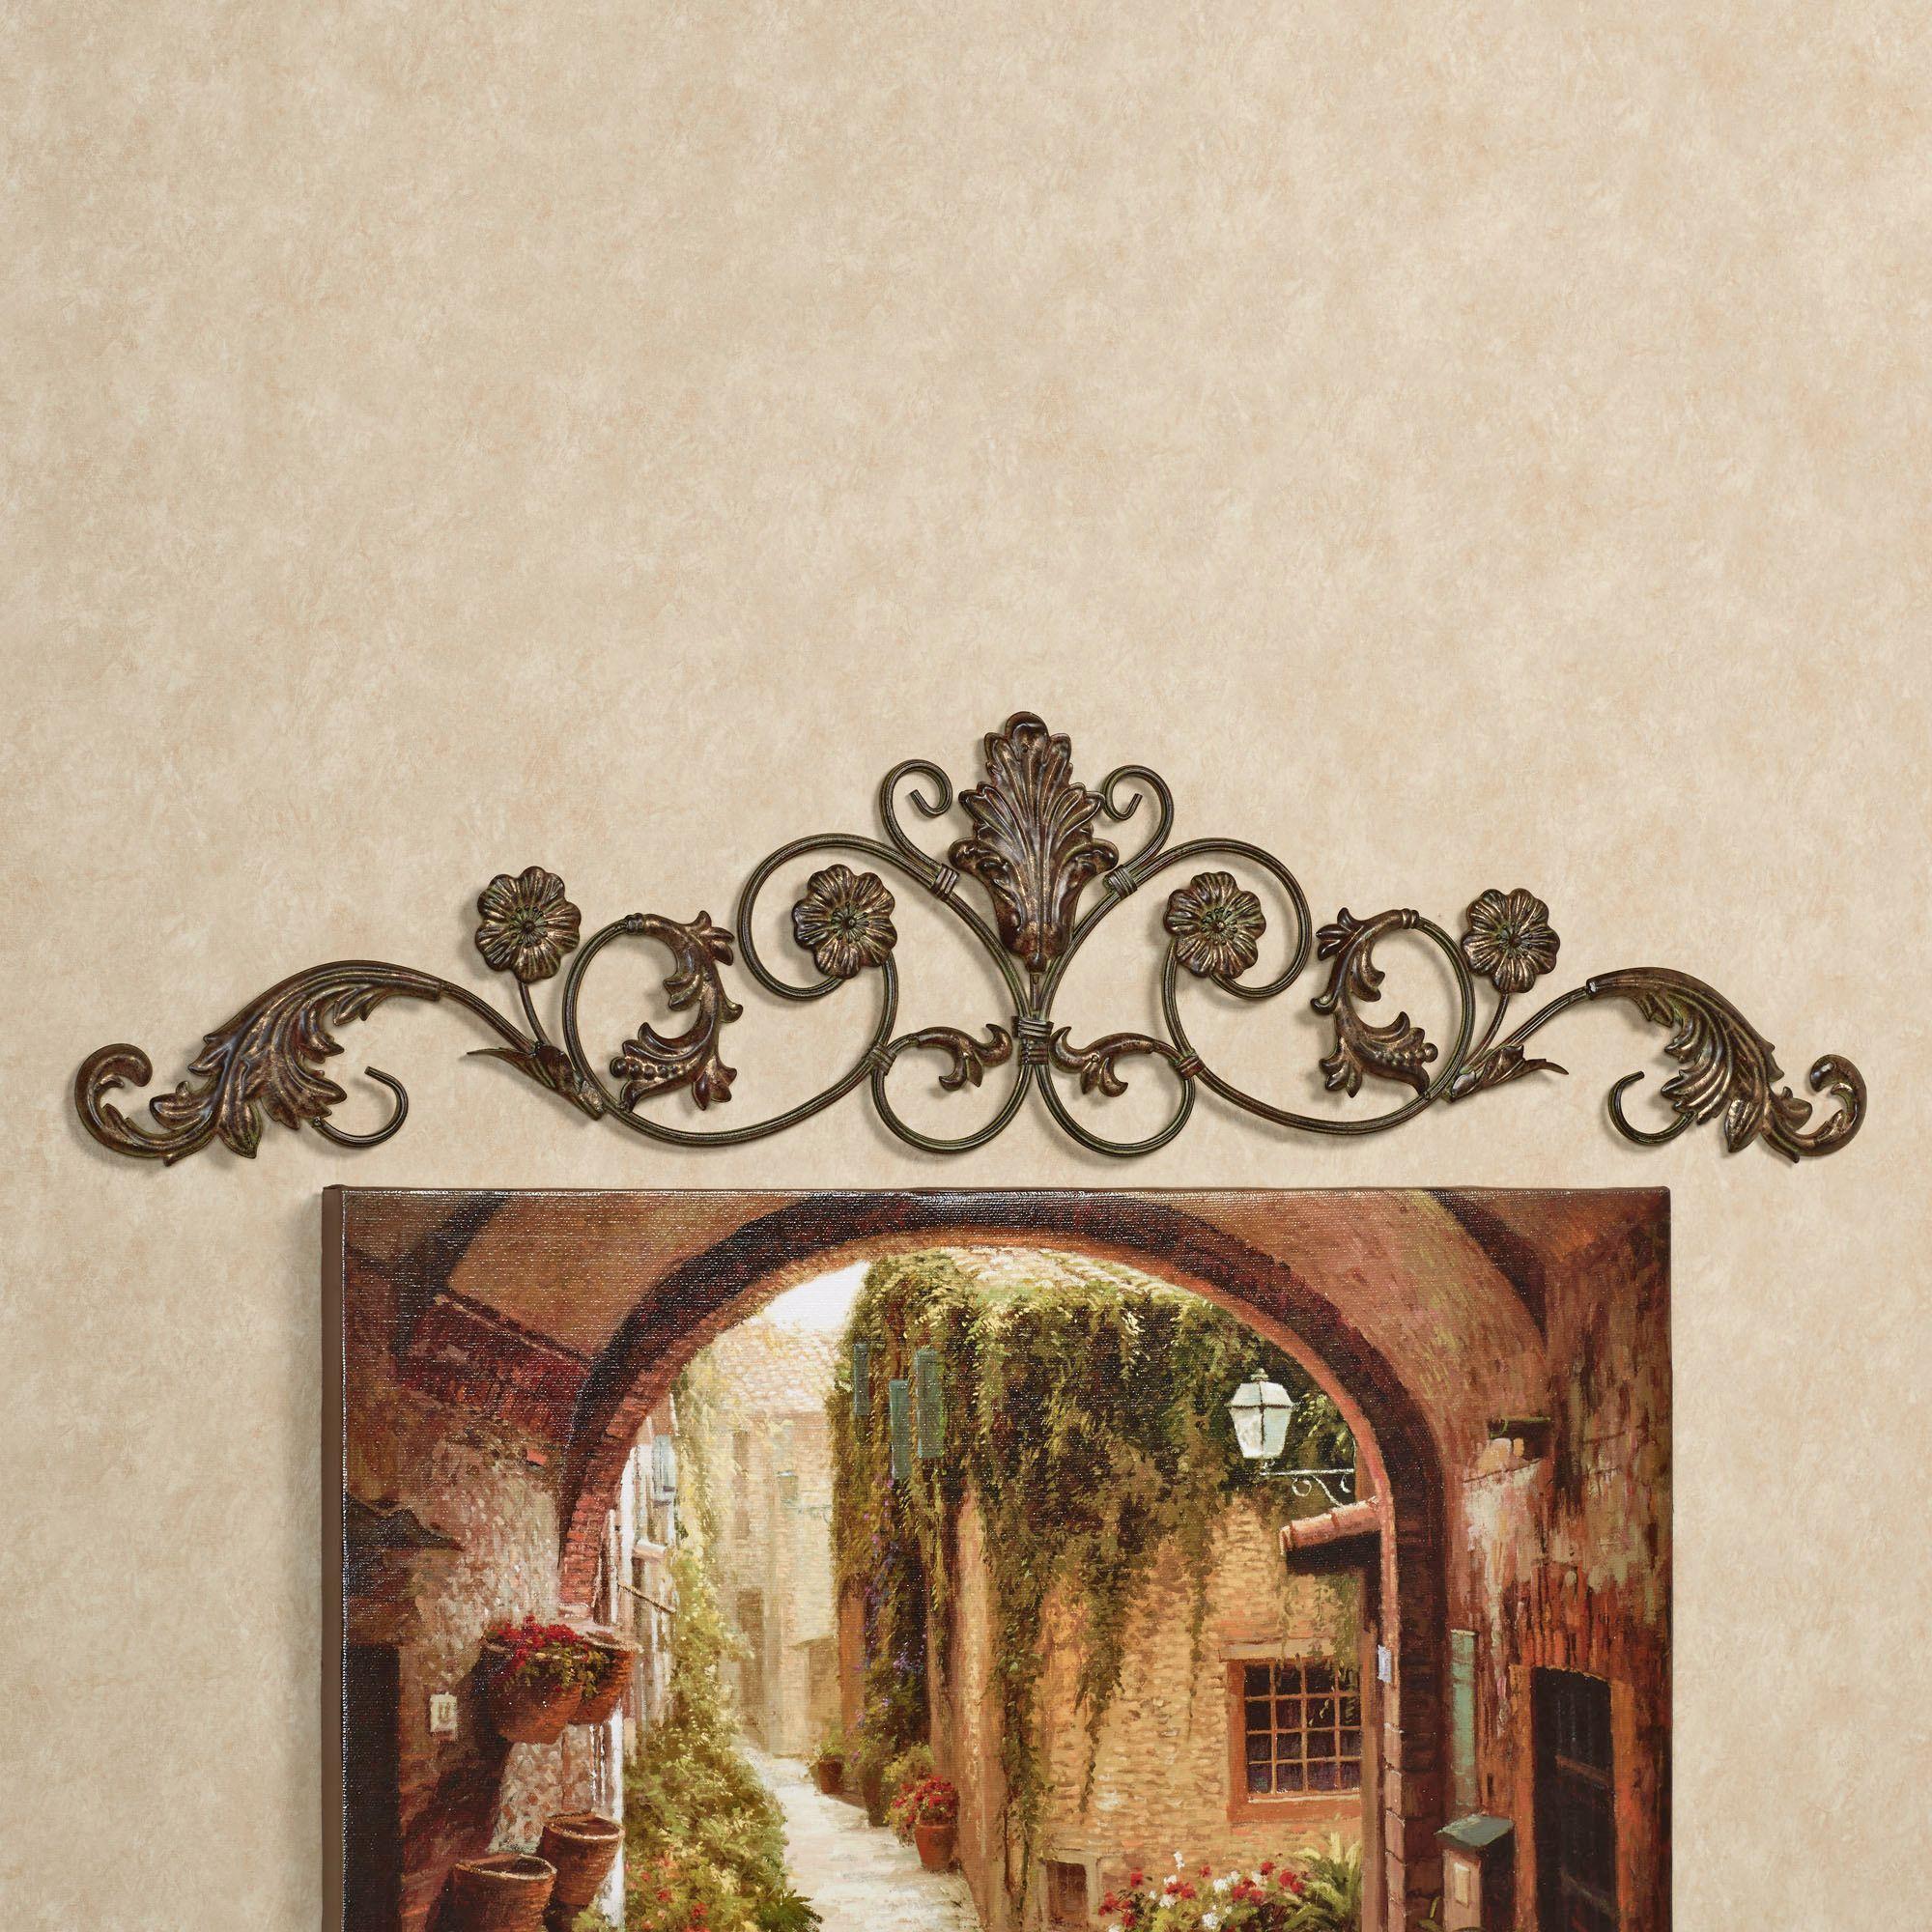 Bronze Wall Decor Violetta Wrought Iron Decorative Wall Topper World Old World